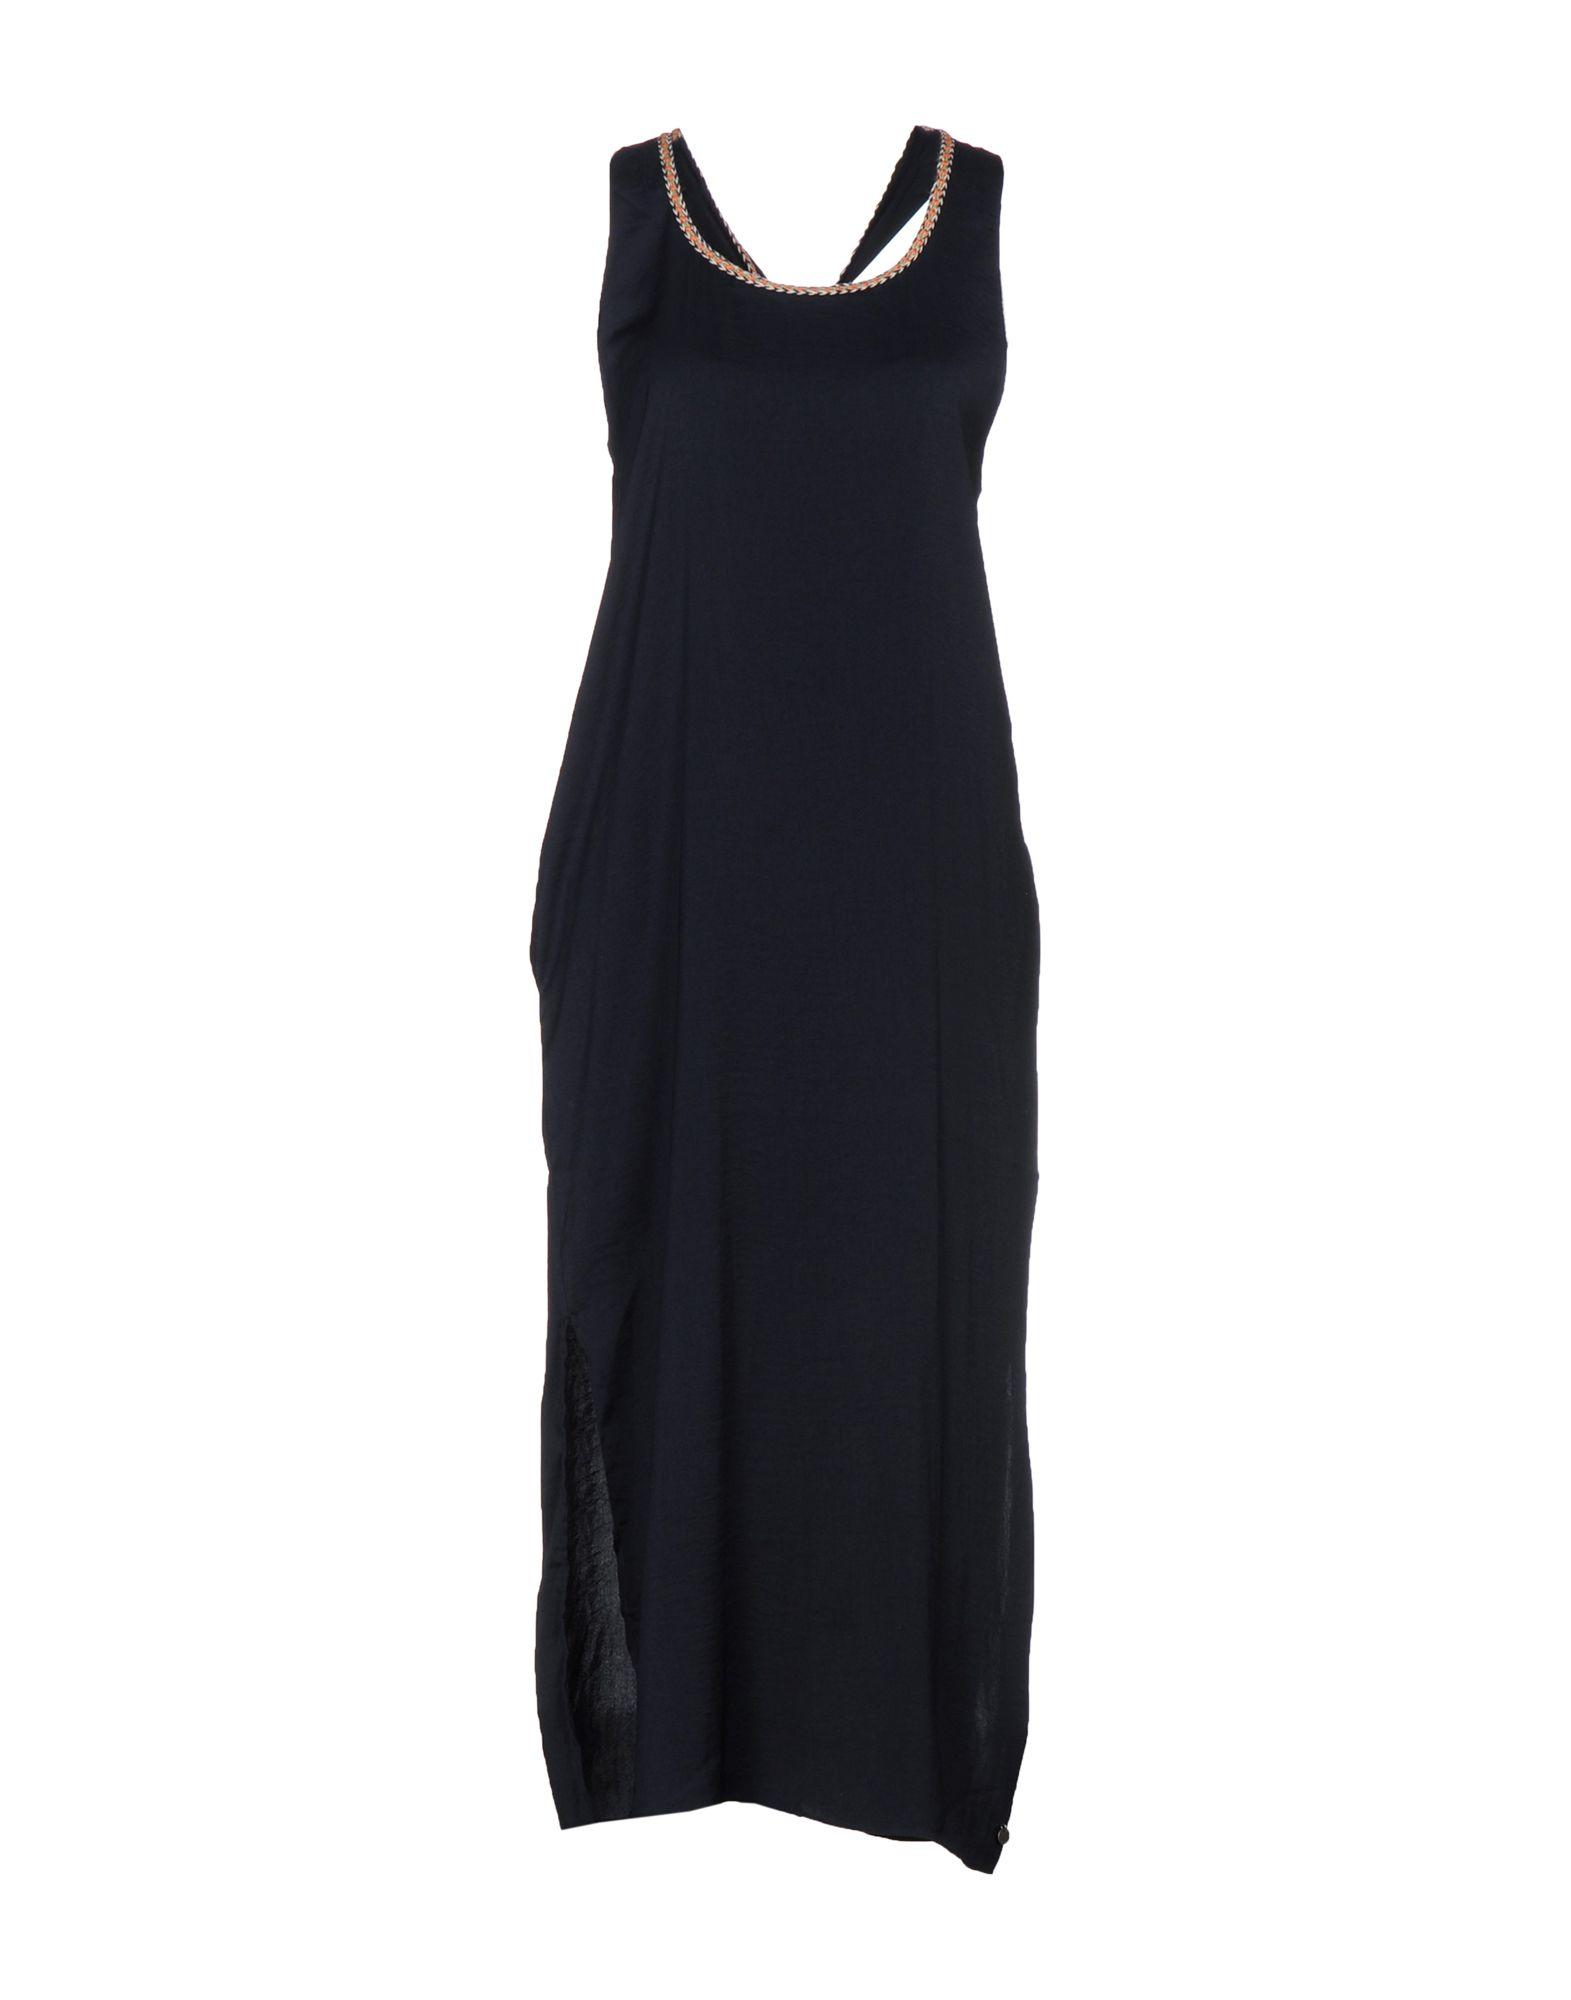 PEPE JEANS Платье длиной 3/4 lisa corti платье длиной 3 4